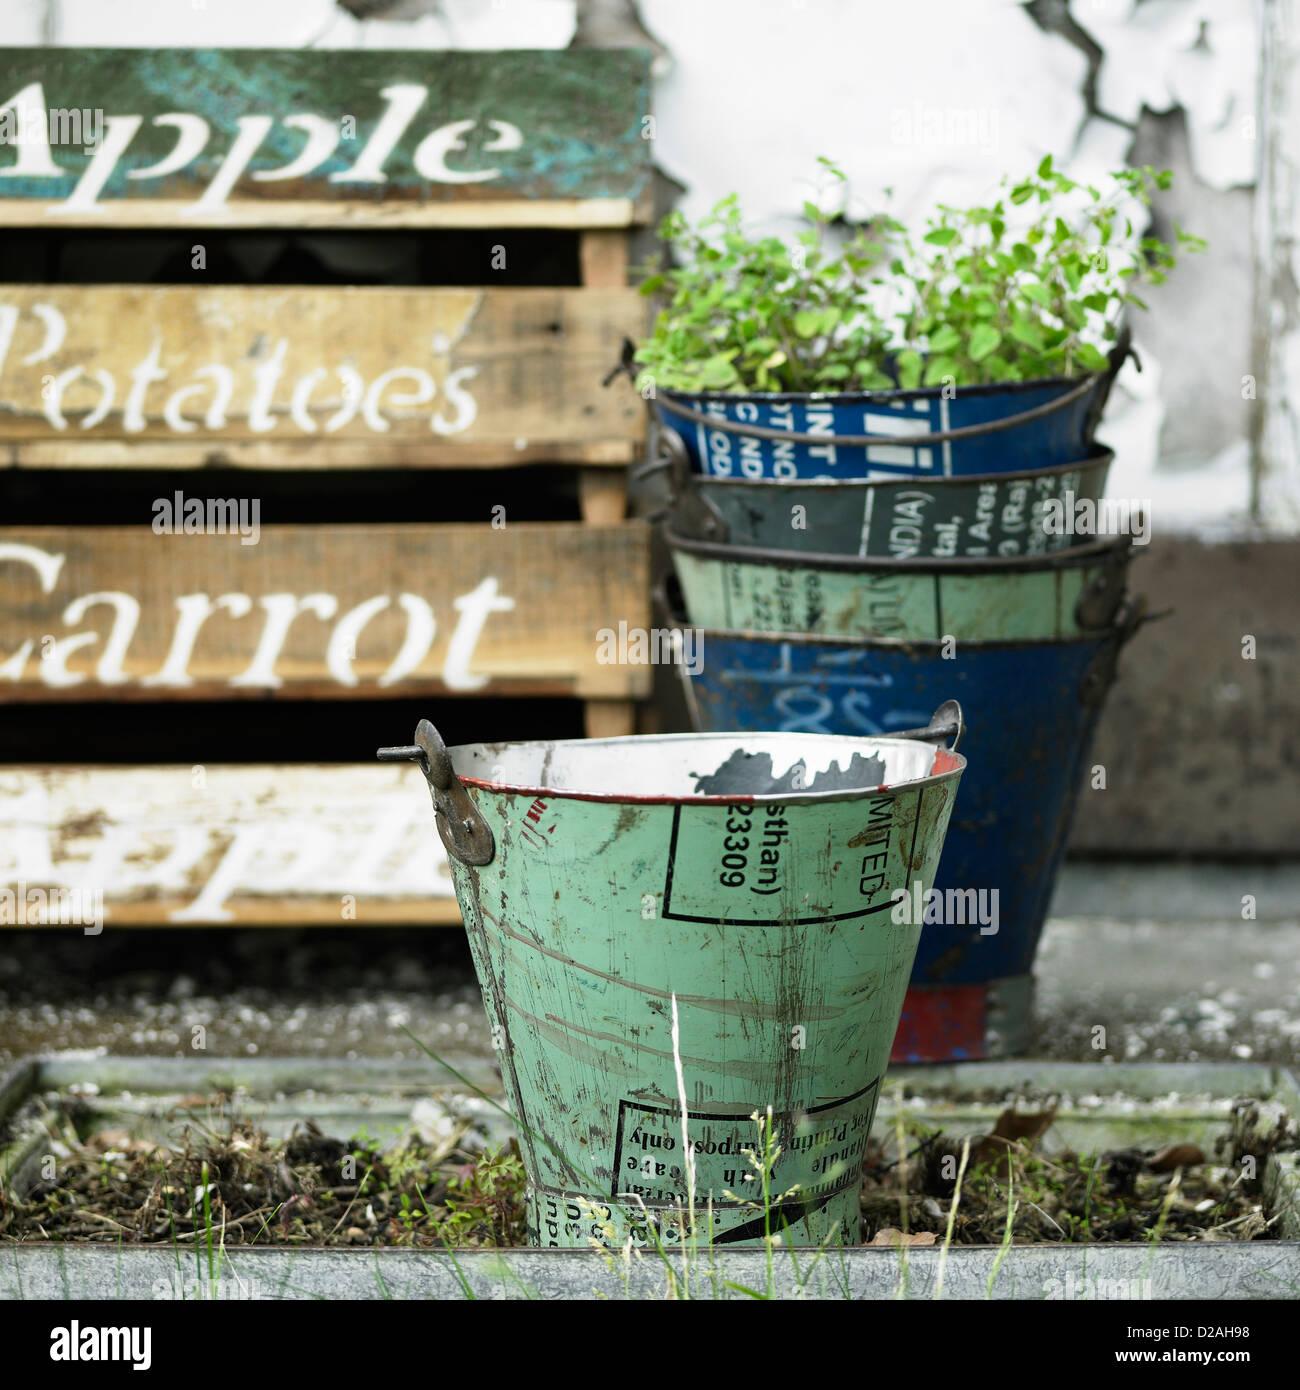 In The Garden Sign Stock Photos & In The Garden Sign Stock Images ...